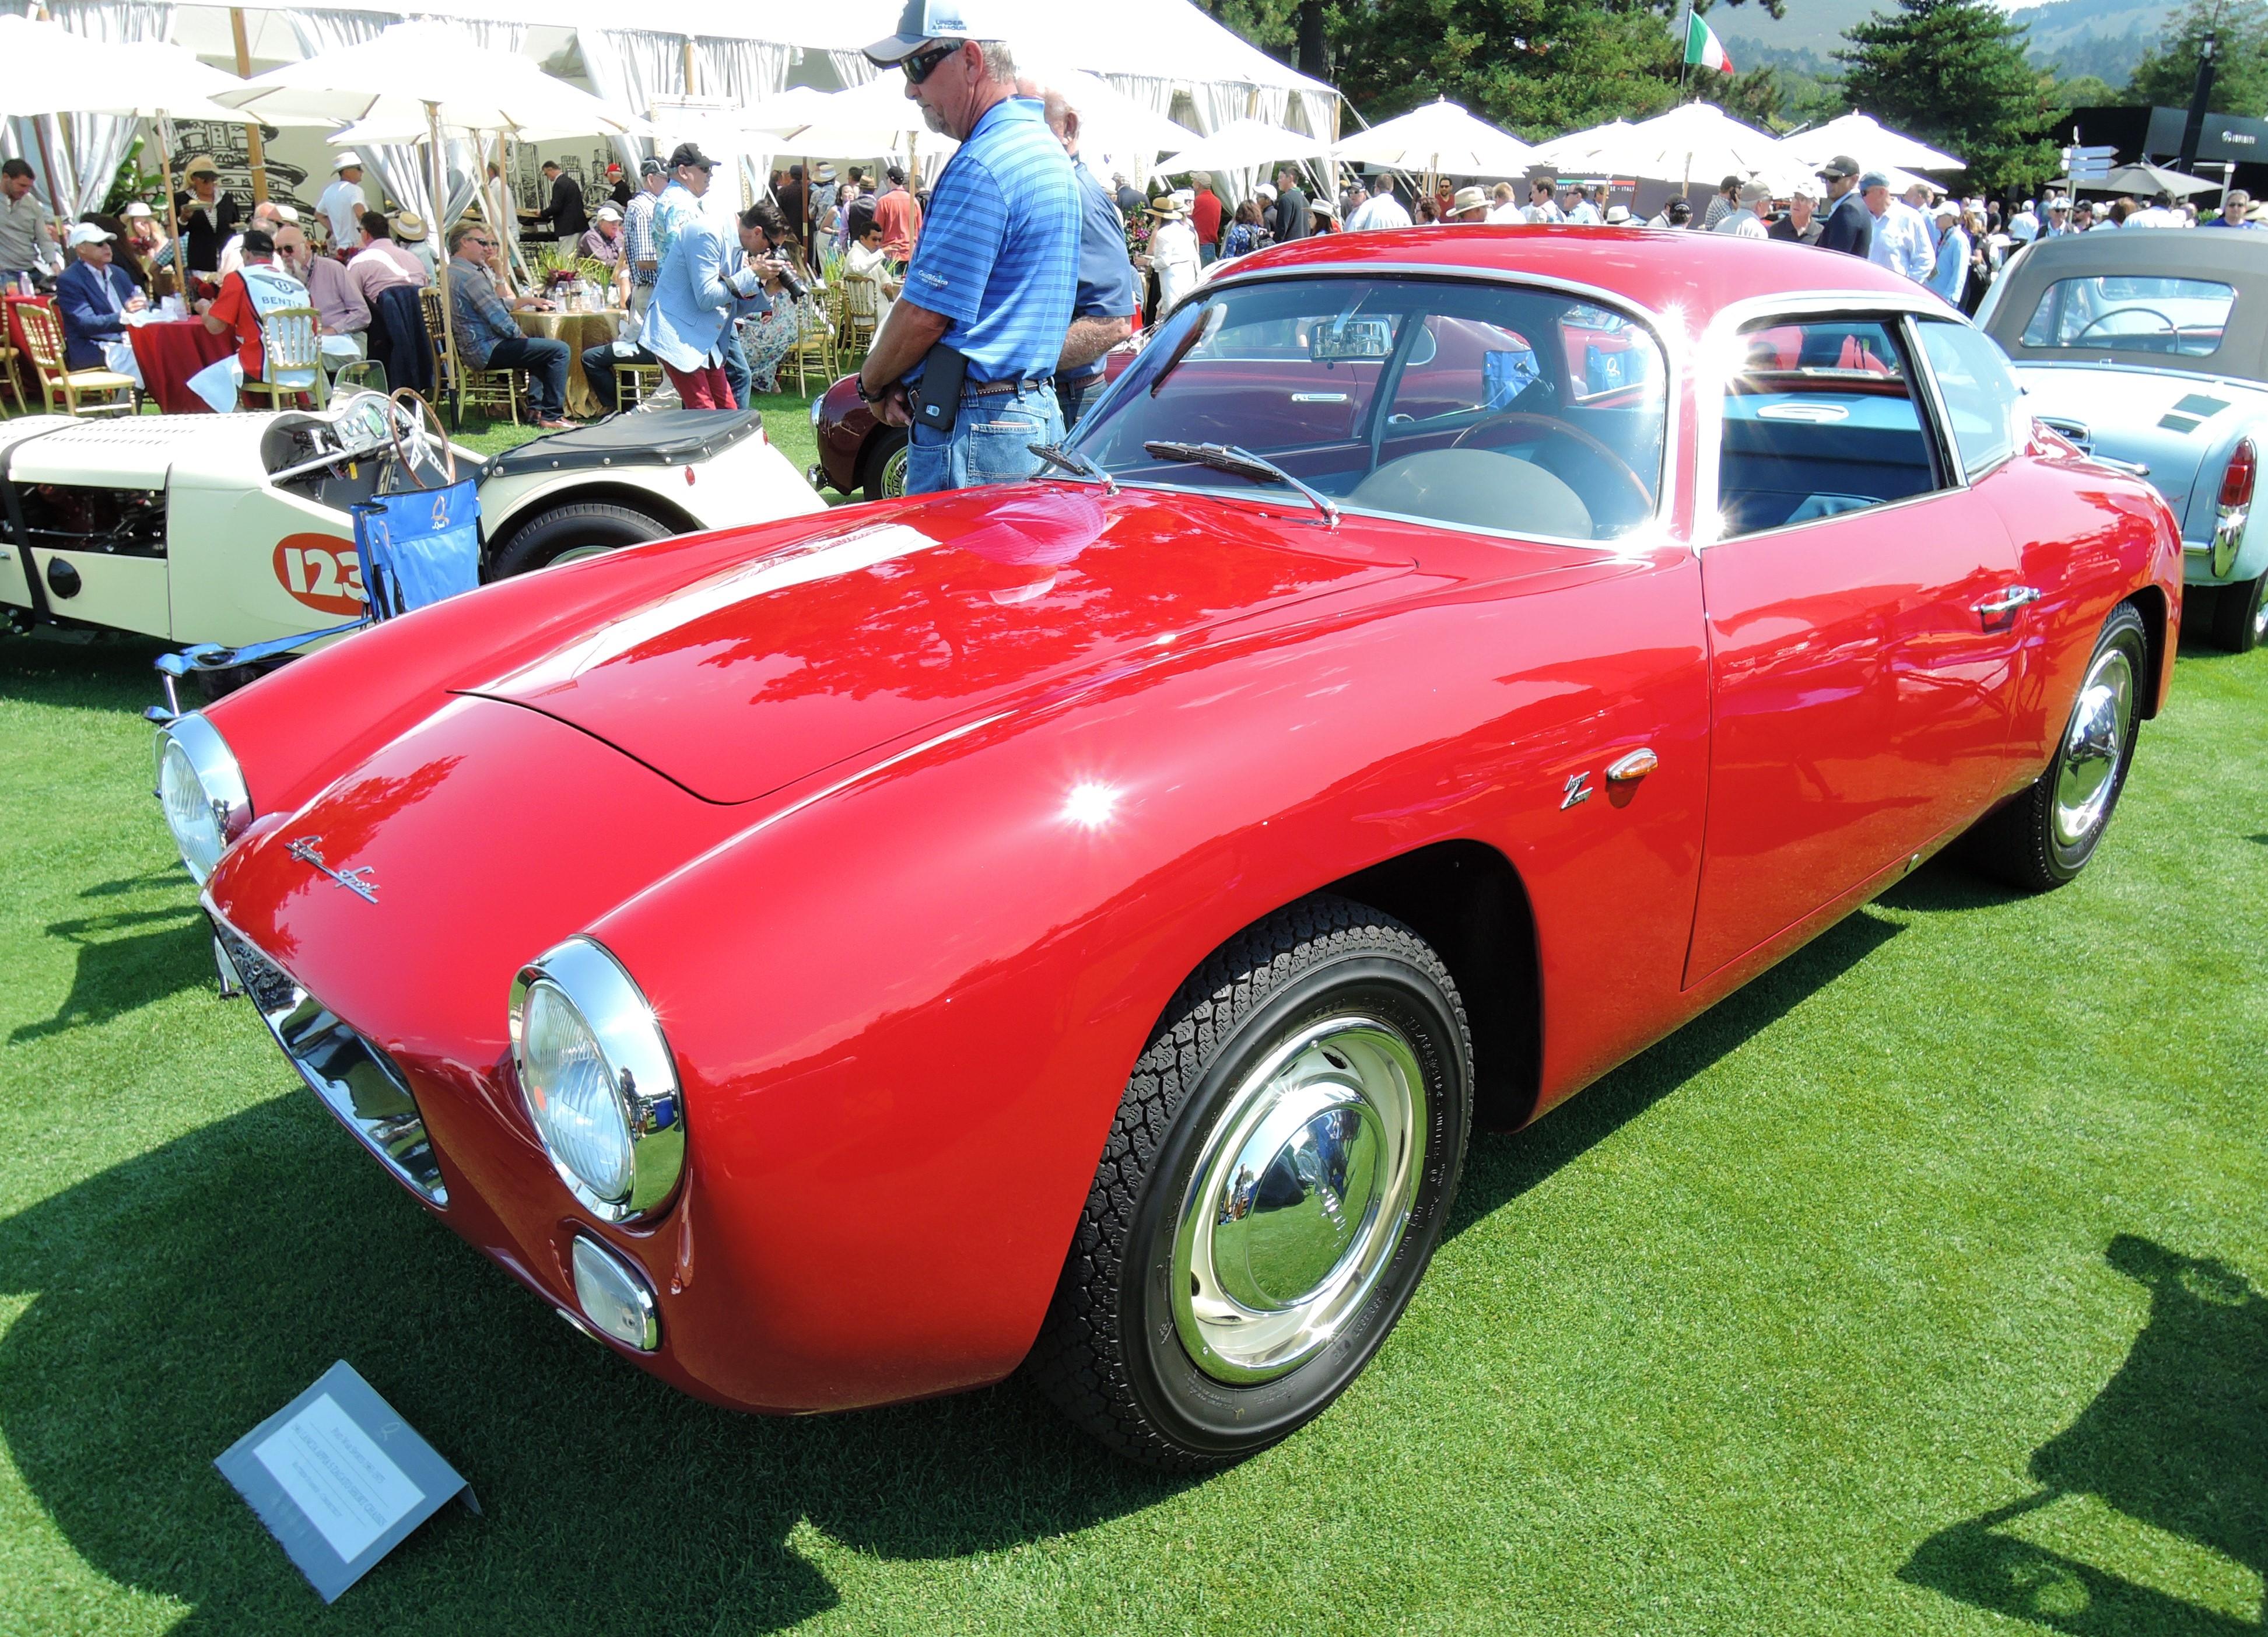 red 1961 Lancia Appia S Zagato Short Chassis - The Quail 2017